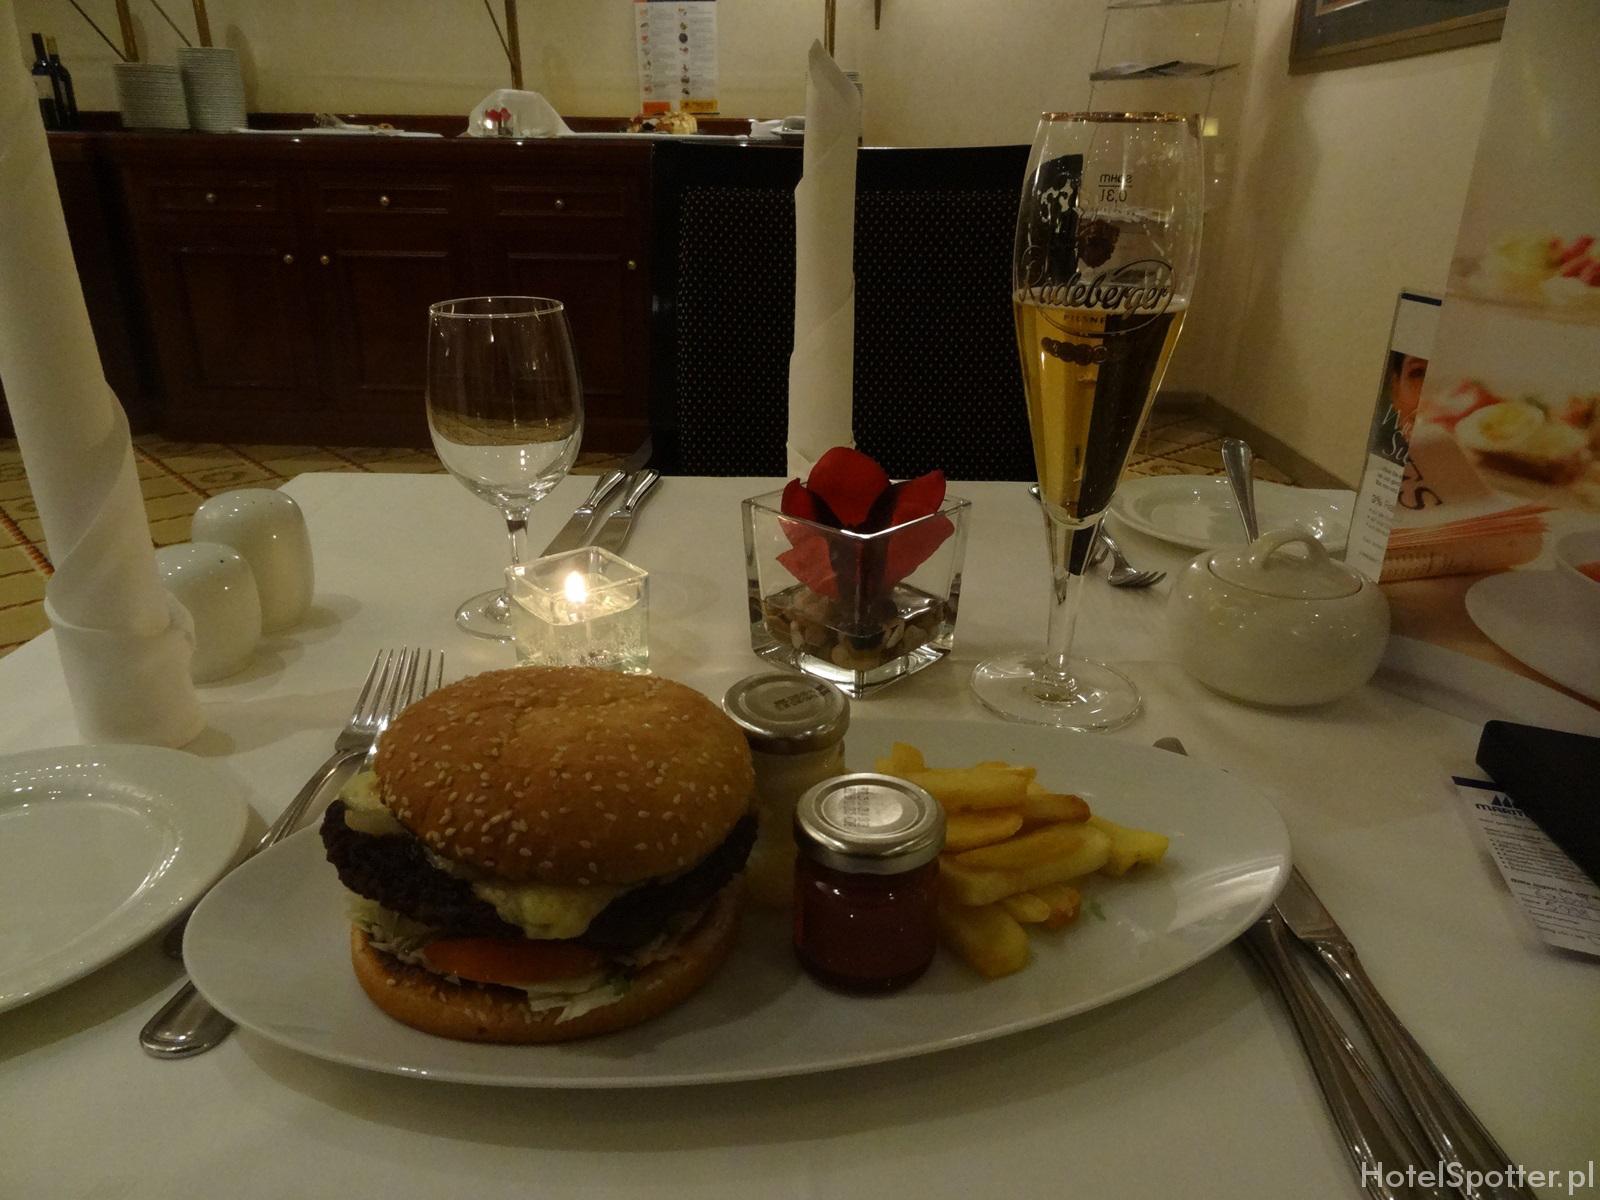 Maritim Hotel Berlin - club lounge free burgers